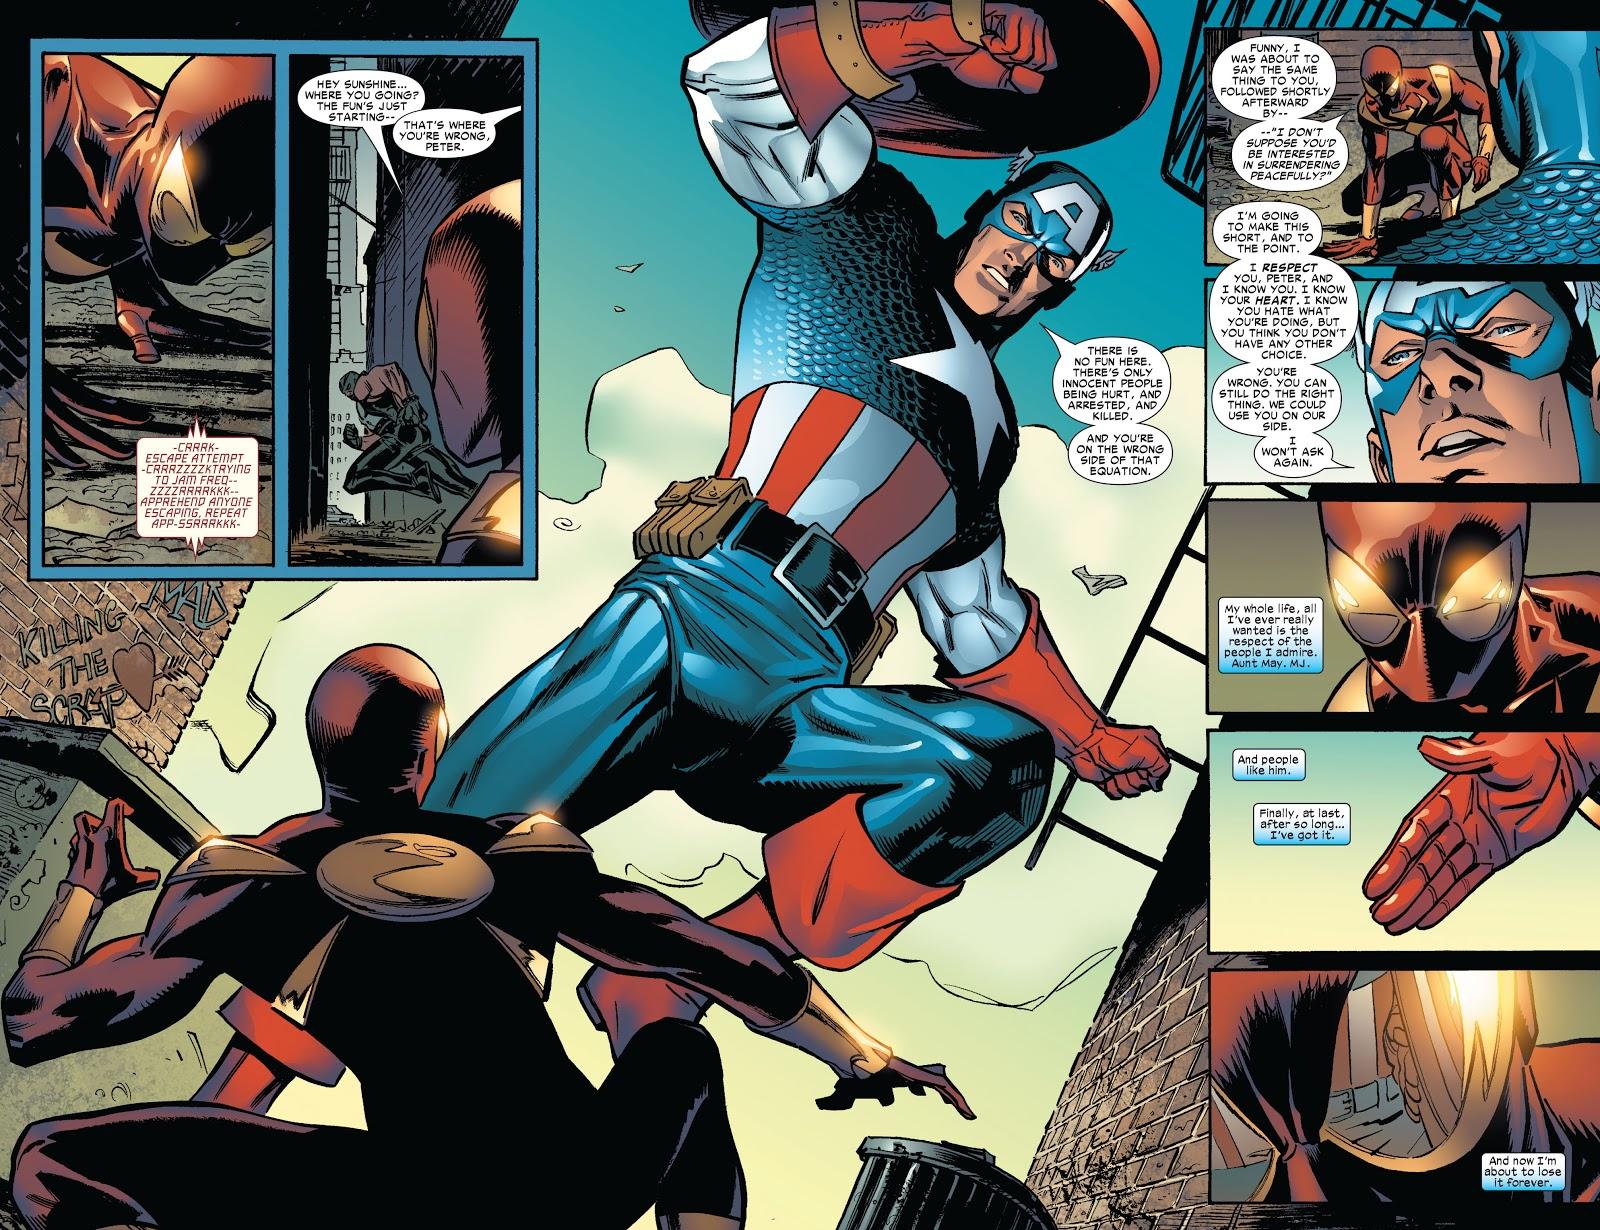 In 'Amazing Spider-Man' (2006) #534, Spider-Man in the iron spider suit faces Captain America.